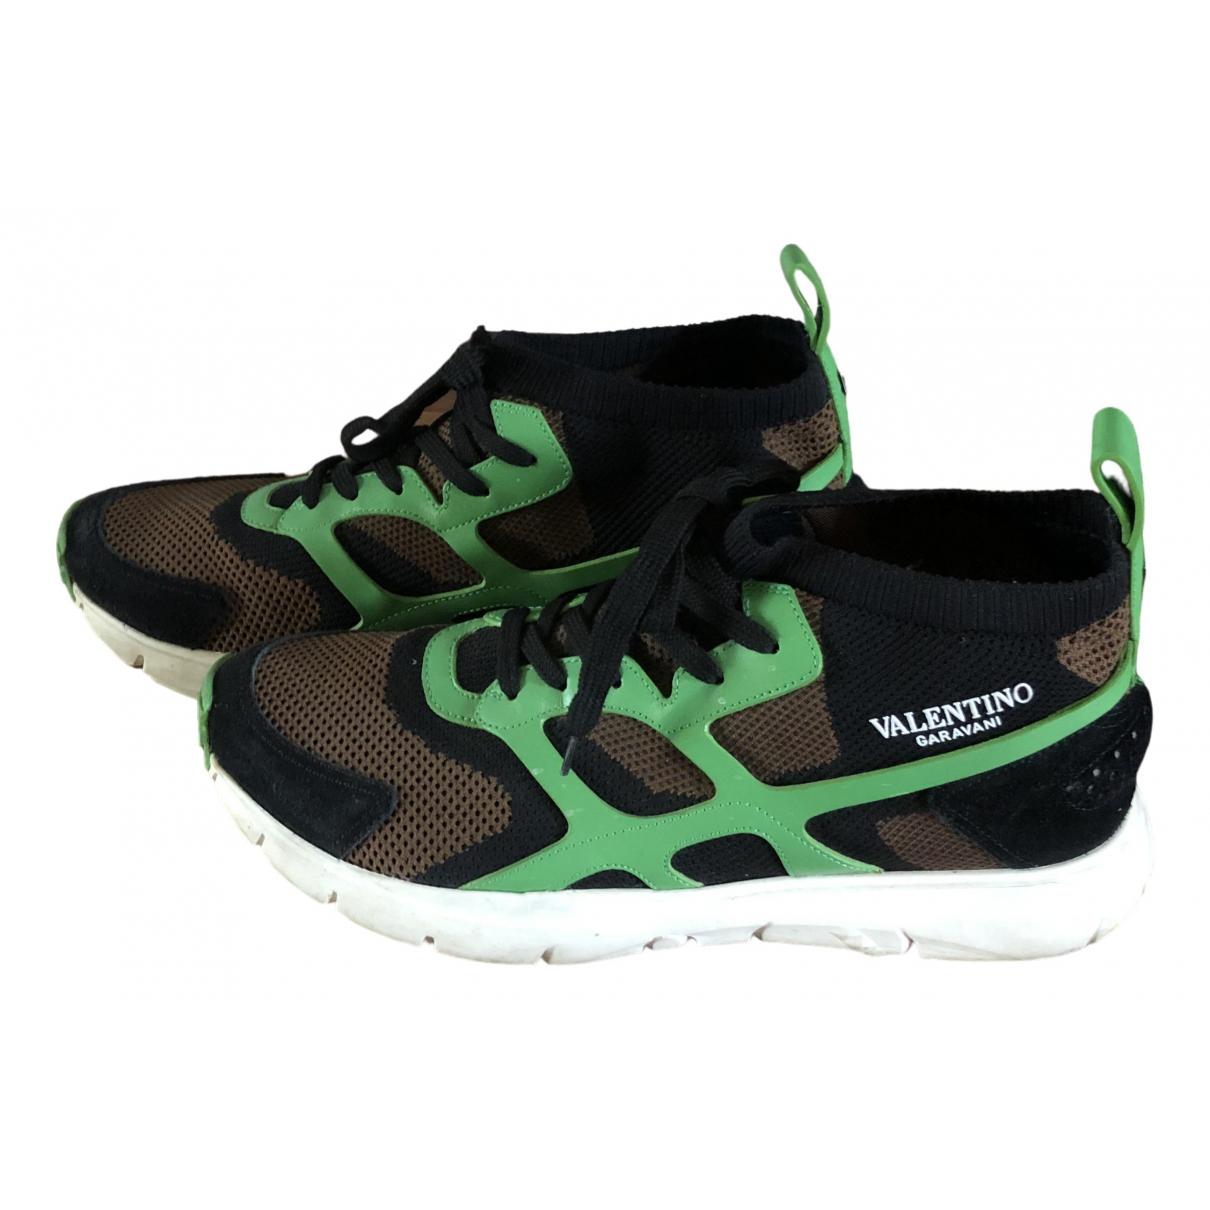 Valentino Garavani Rockrunner Sneakers in  Gruen Leinen